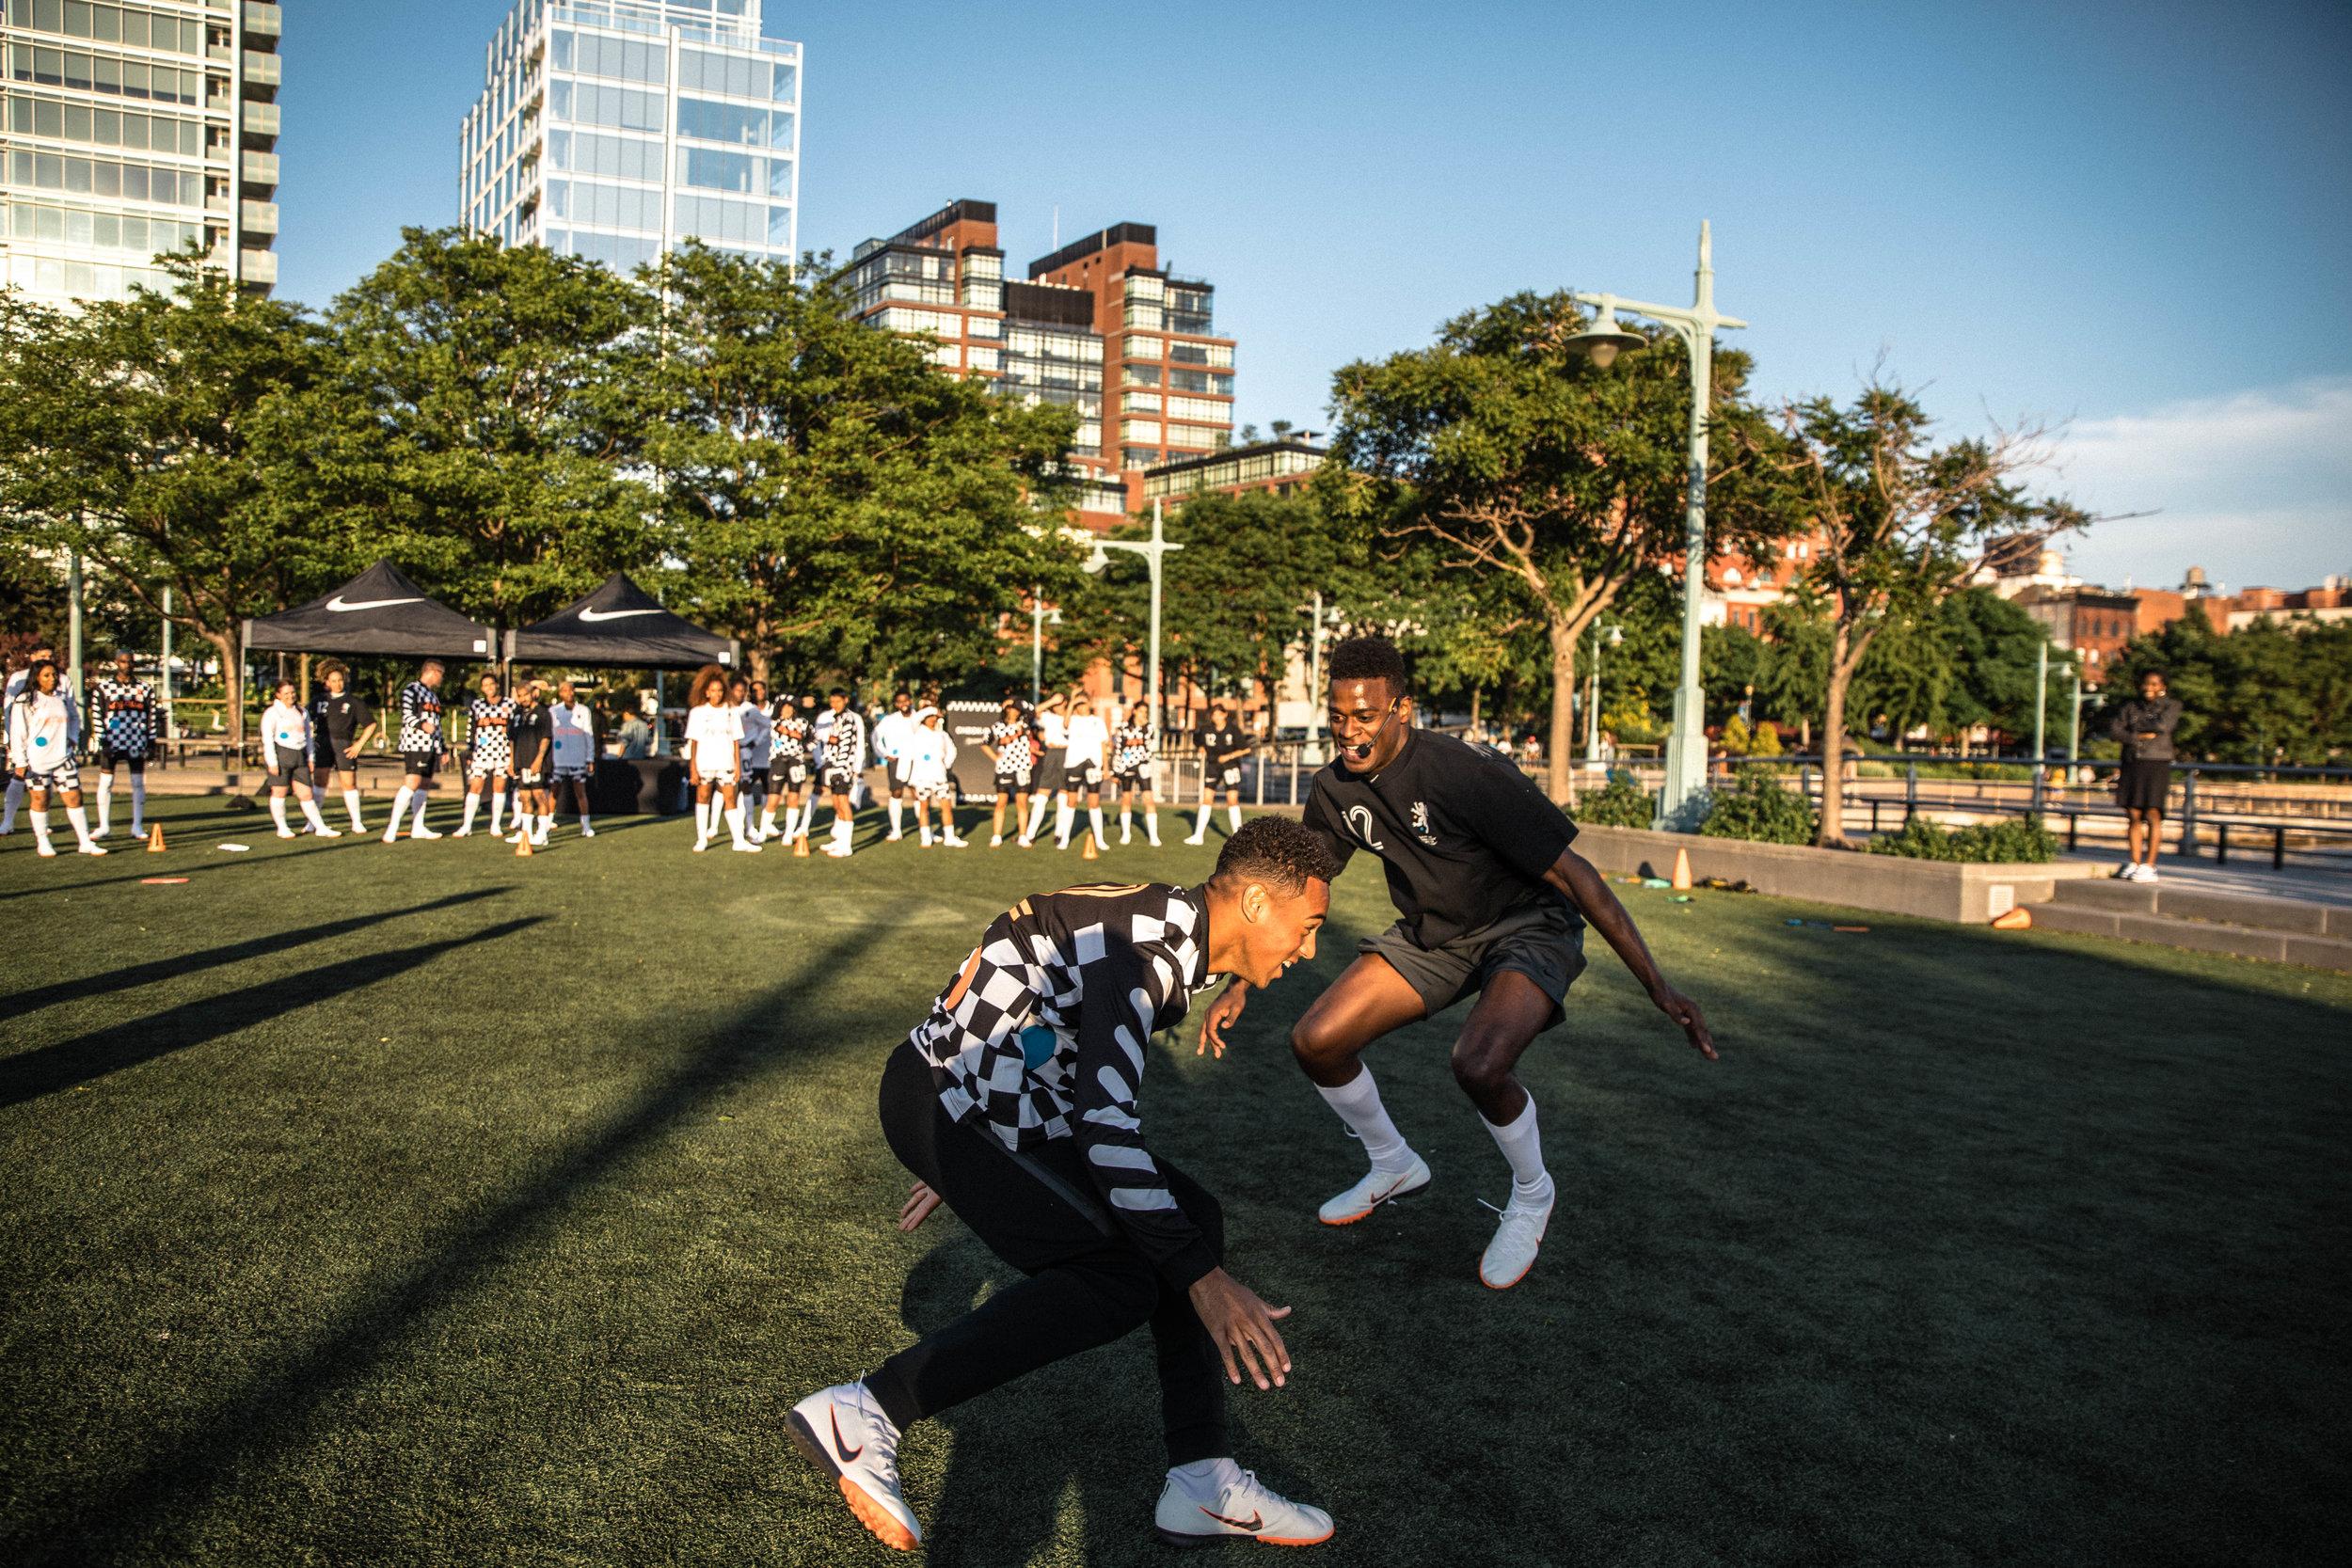 Football_Mon_Amour_Nike_NYC_64.jpg